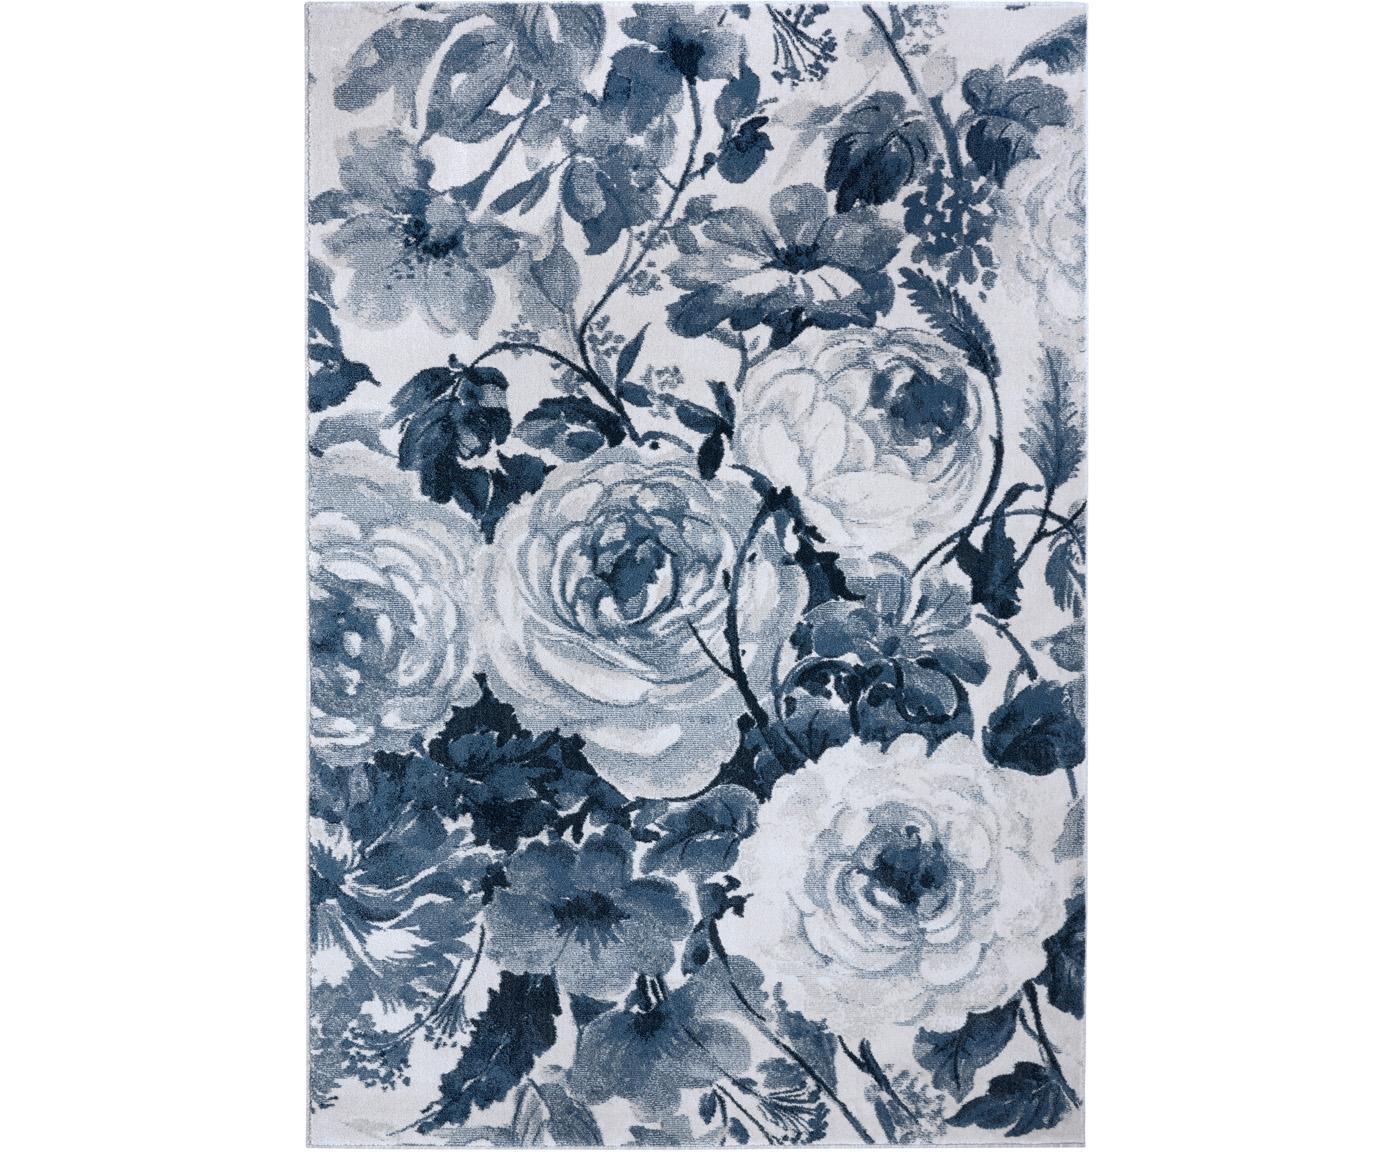 Teppich Peony mit Blumenmuster, 100% Polypropylen, Blau, Cremefarben, B 80 x L 150 cm (Größe XS)